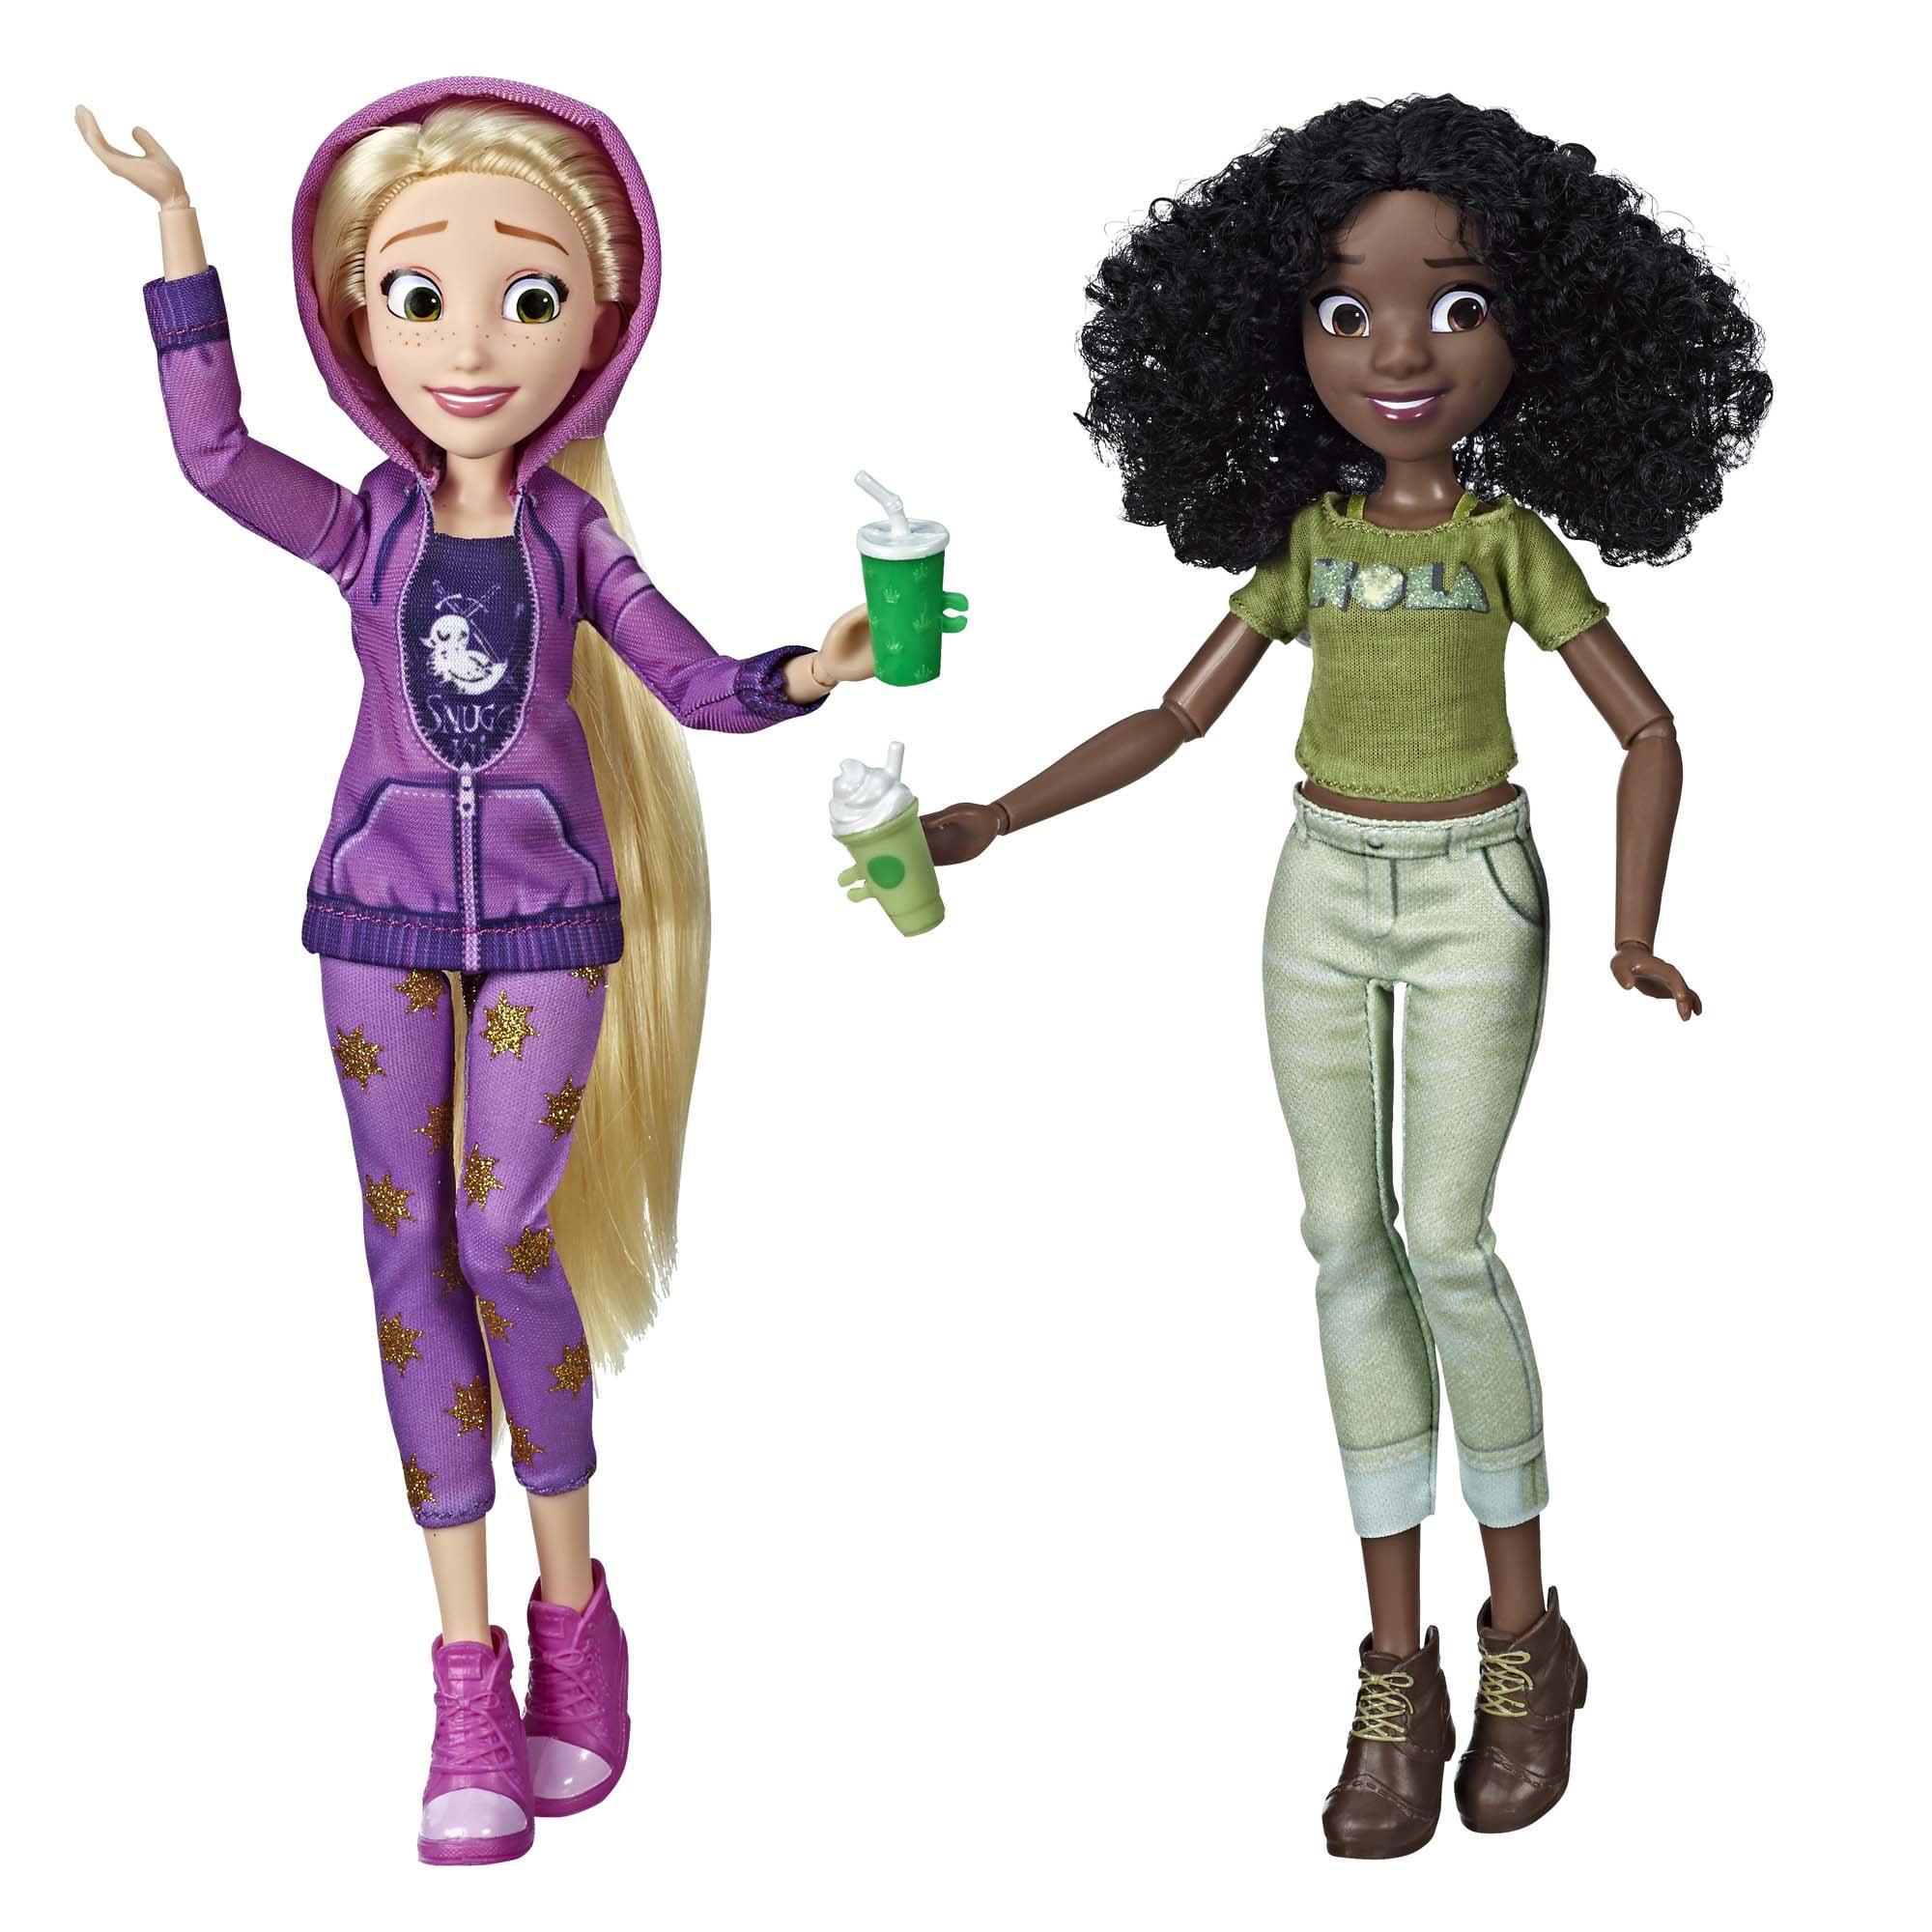 Disney Princess Ralph Breaks the Internet Dolls, Rapunzel and Tiana